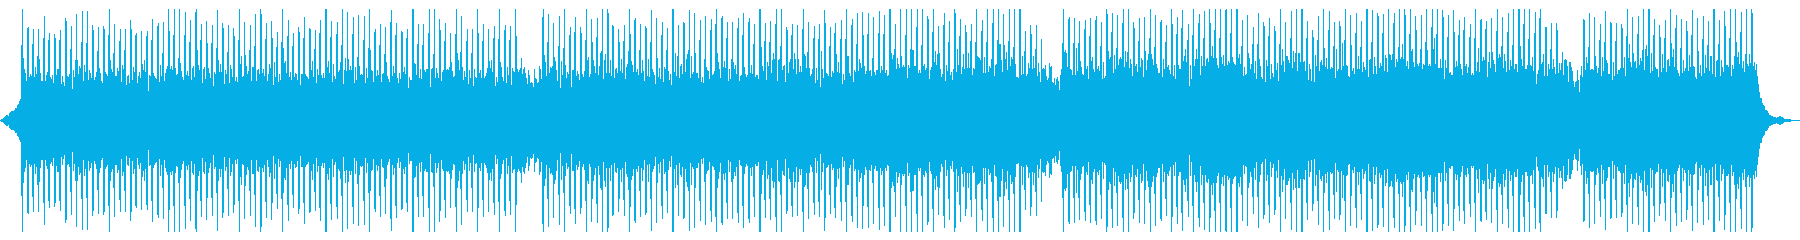 Successfulの再生済みの波形